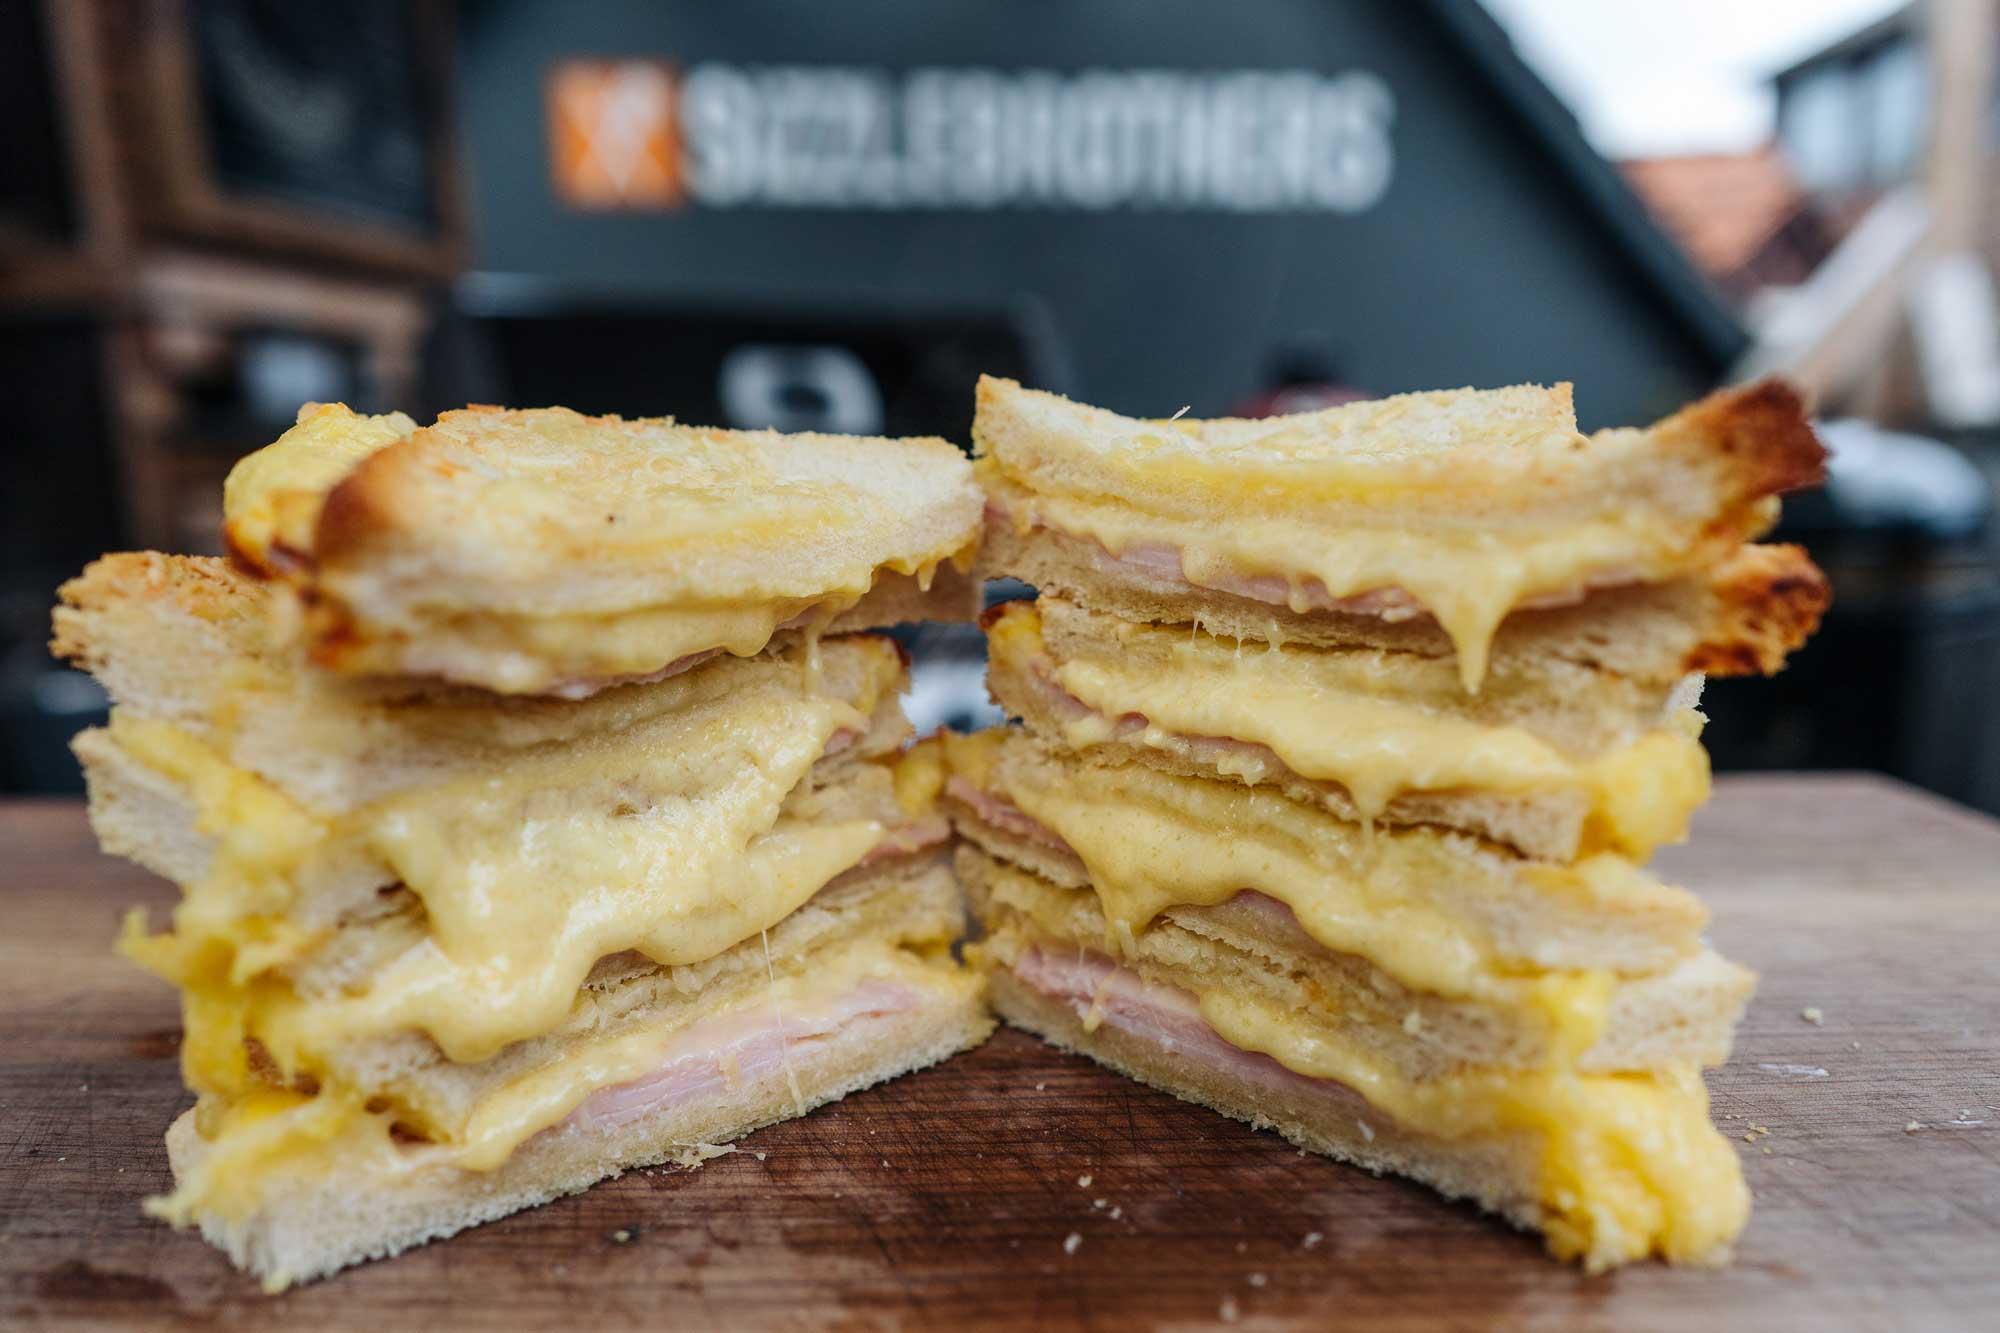 Croque Monsieur Sandwich selber machen – so geht's!